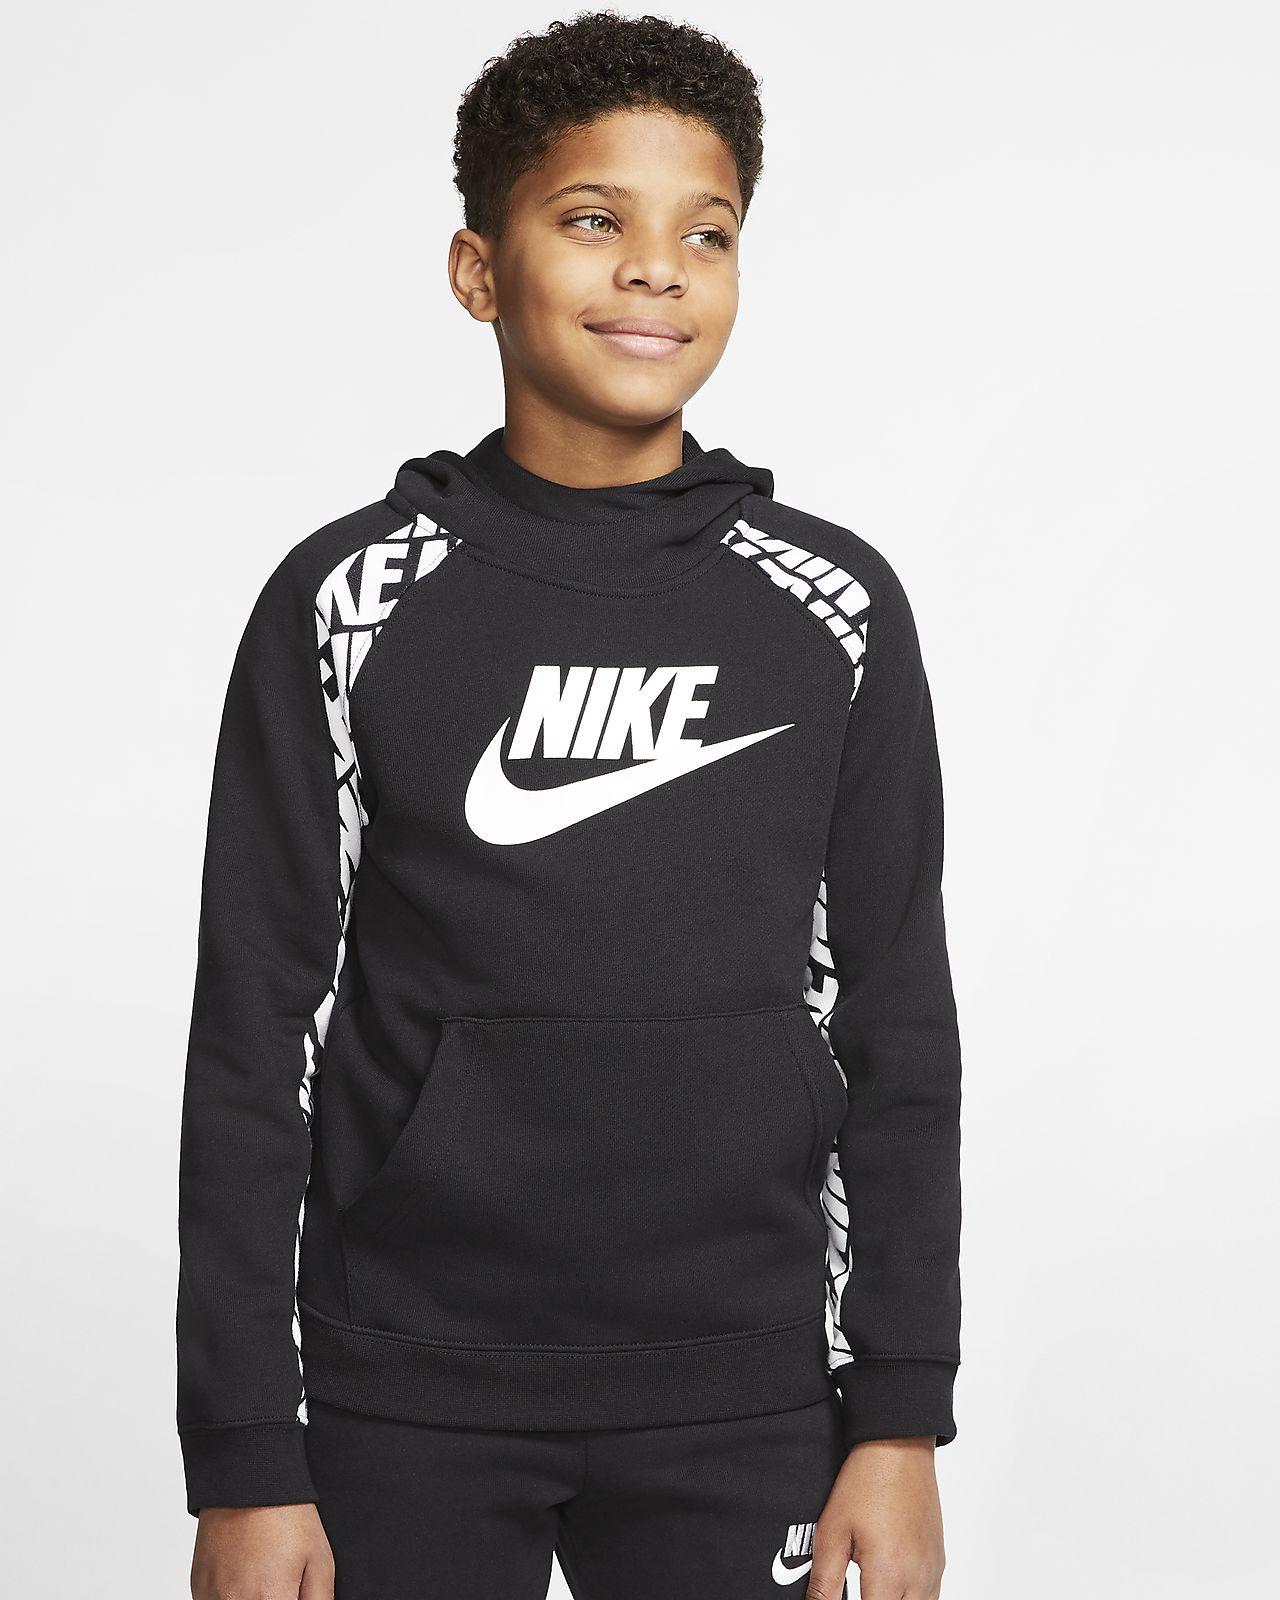 Nike Therma Erkek Çocuk Kapüşonlu Sweatshirt